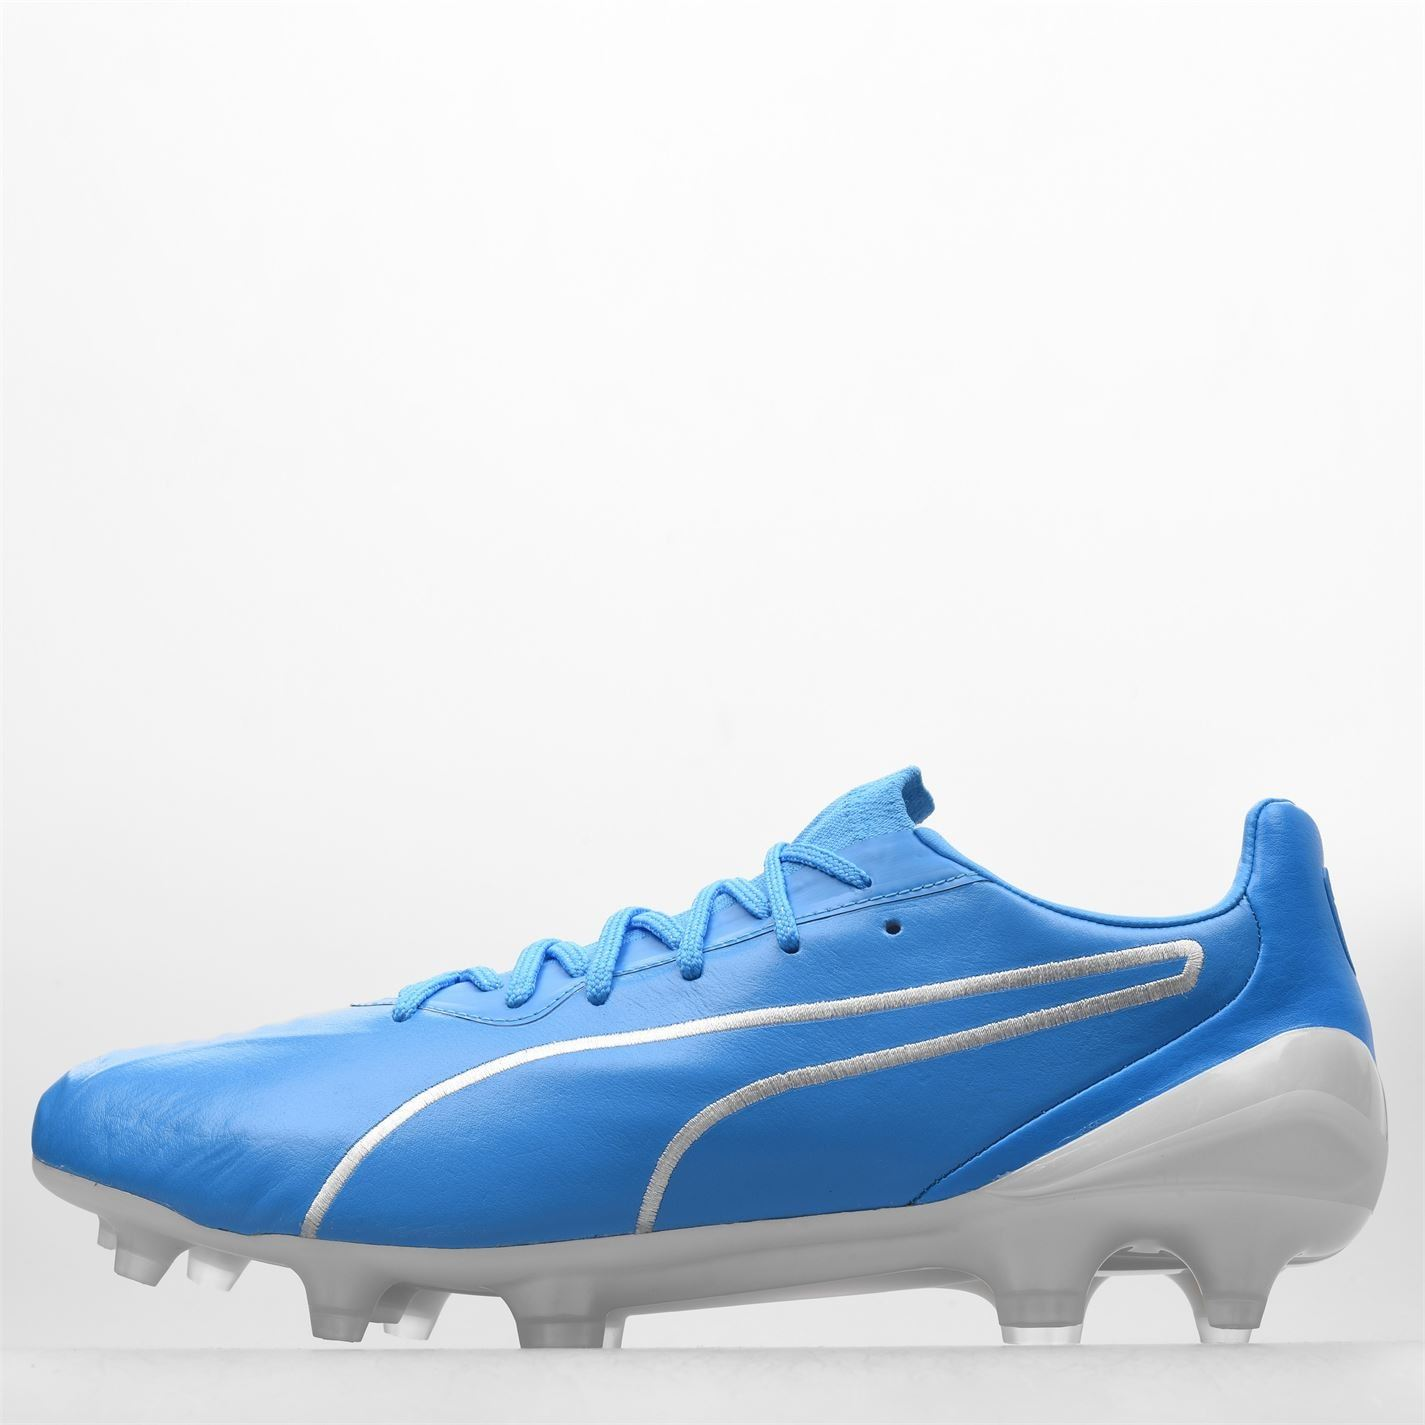 miniature 5 - Puma-King-FG-Firm-Ground-Football-Bottes-Homme-Chaussures-De-Foot-Crampons-Baskets